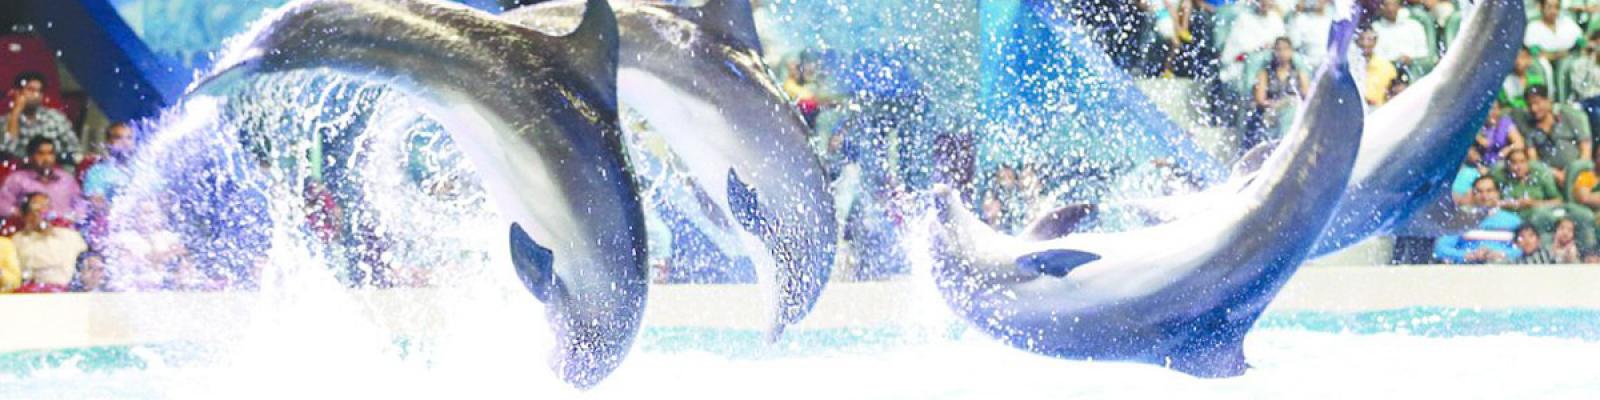 dubai dolphinarium tour, swim with dolphins dubai dolphinarium, dubai dolphinarium swim with dolphins price